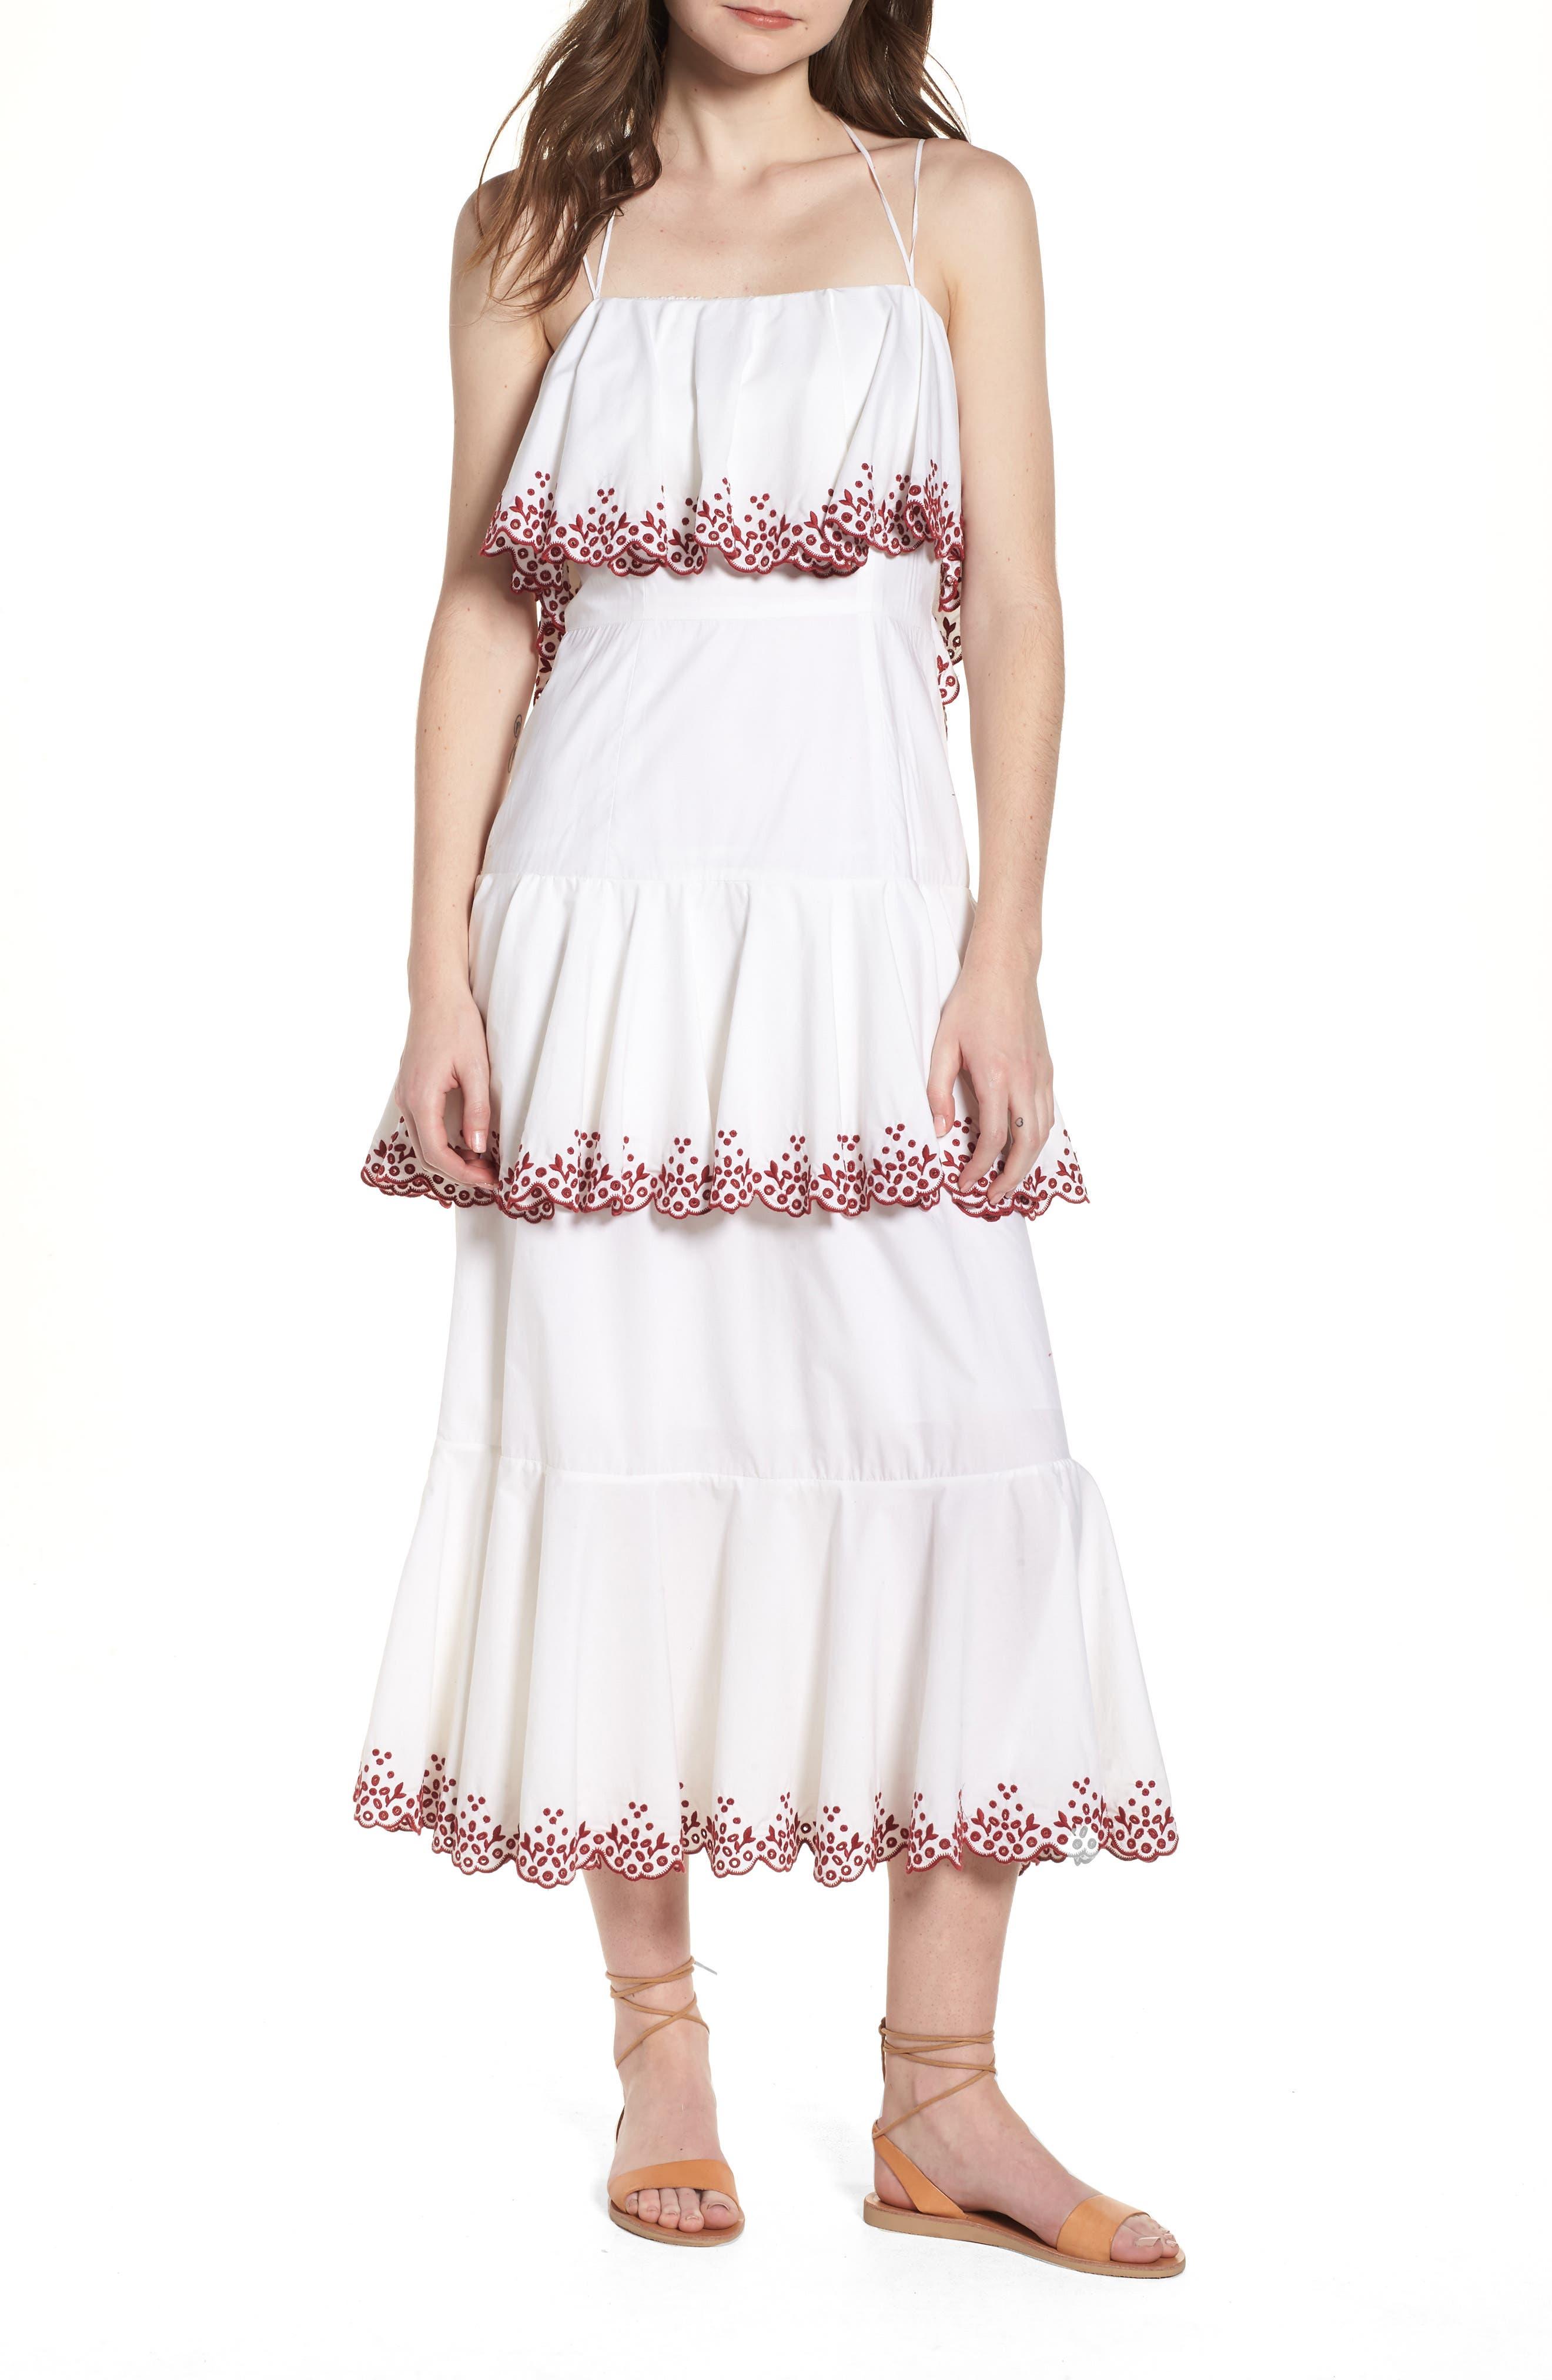 Rebecca Minkoff Clarissa Tiered Dress